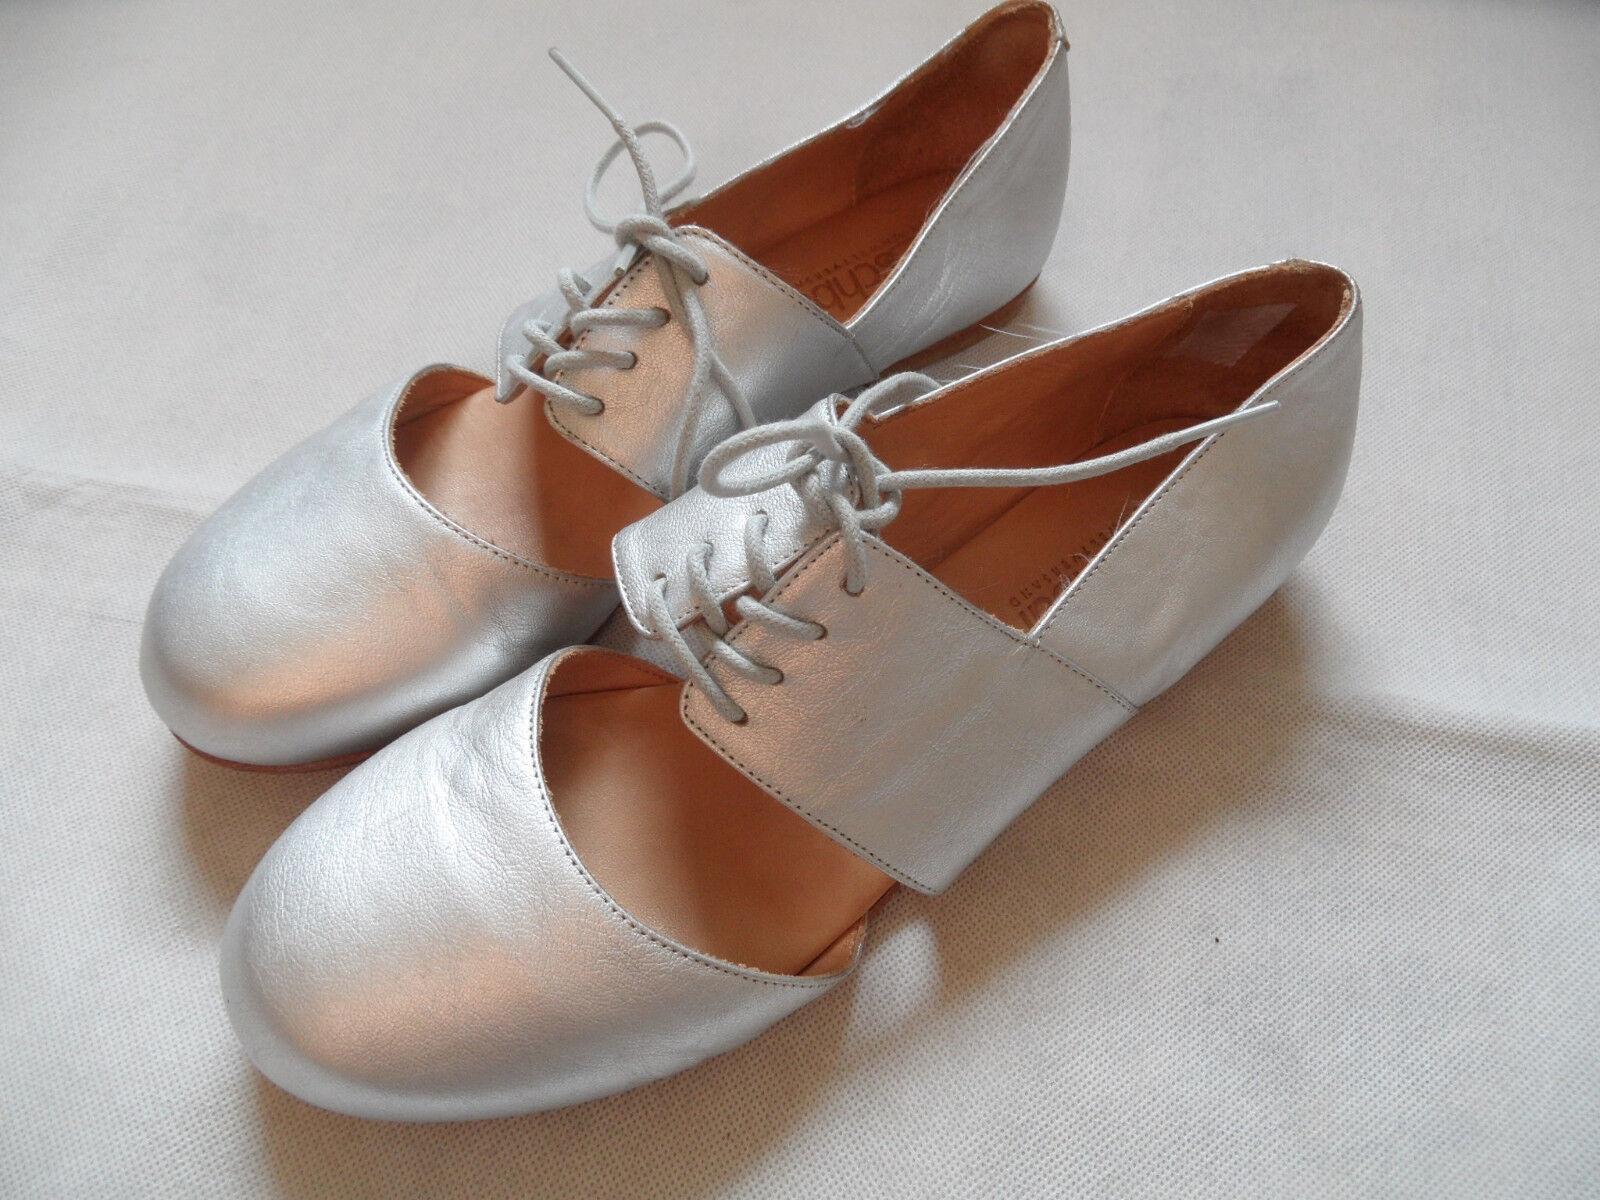 Procione hmi818 eleganti ballerine sandali argento tg. 40 Top hmi818 Procione 62eaa1